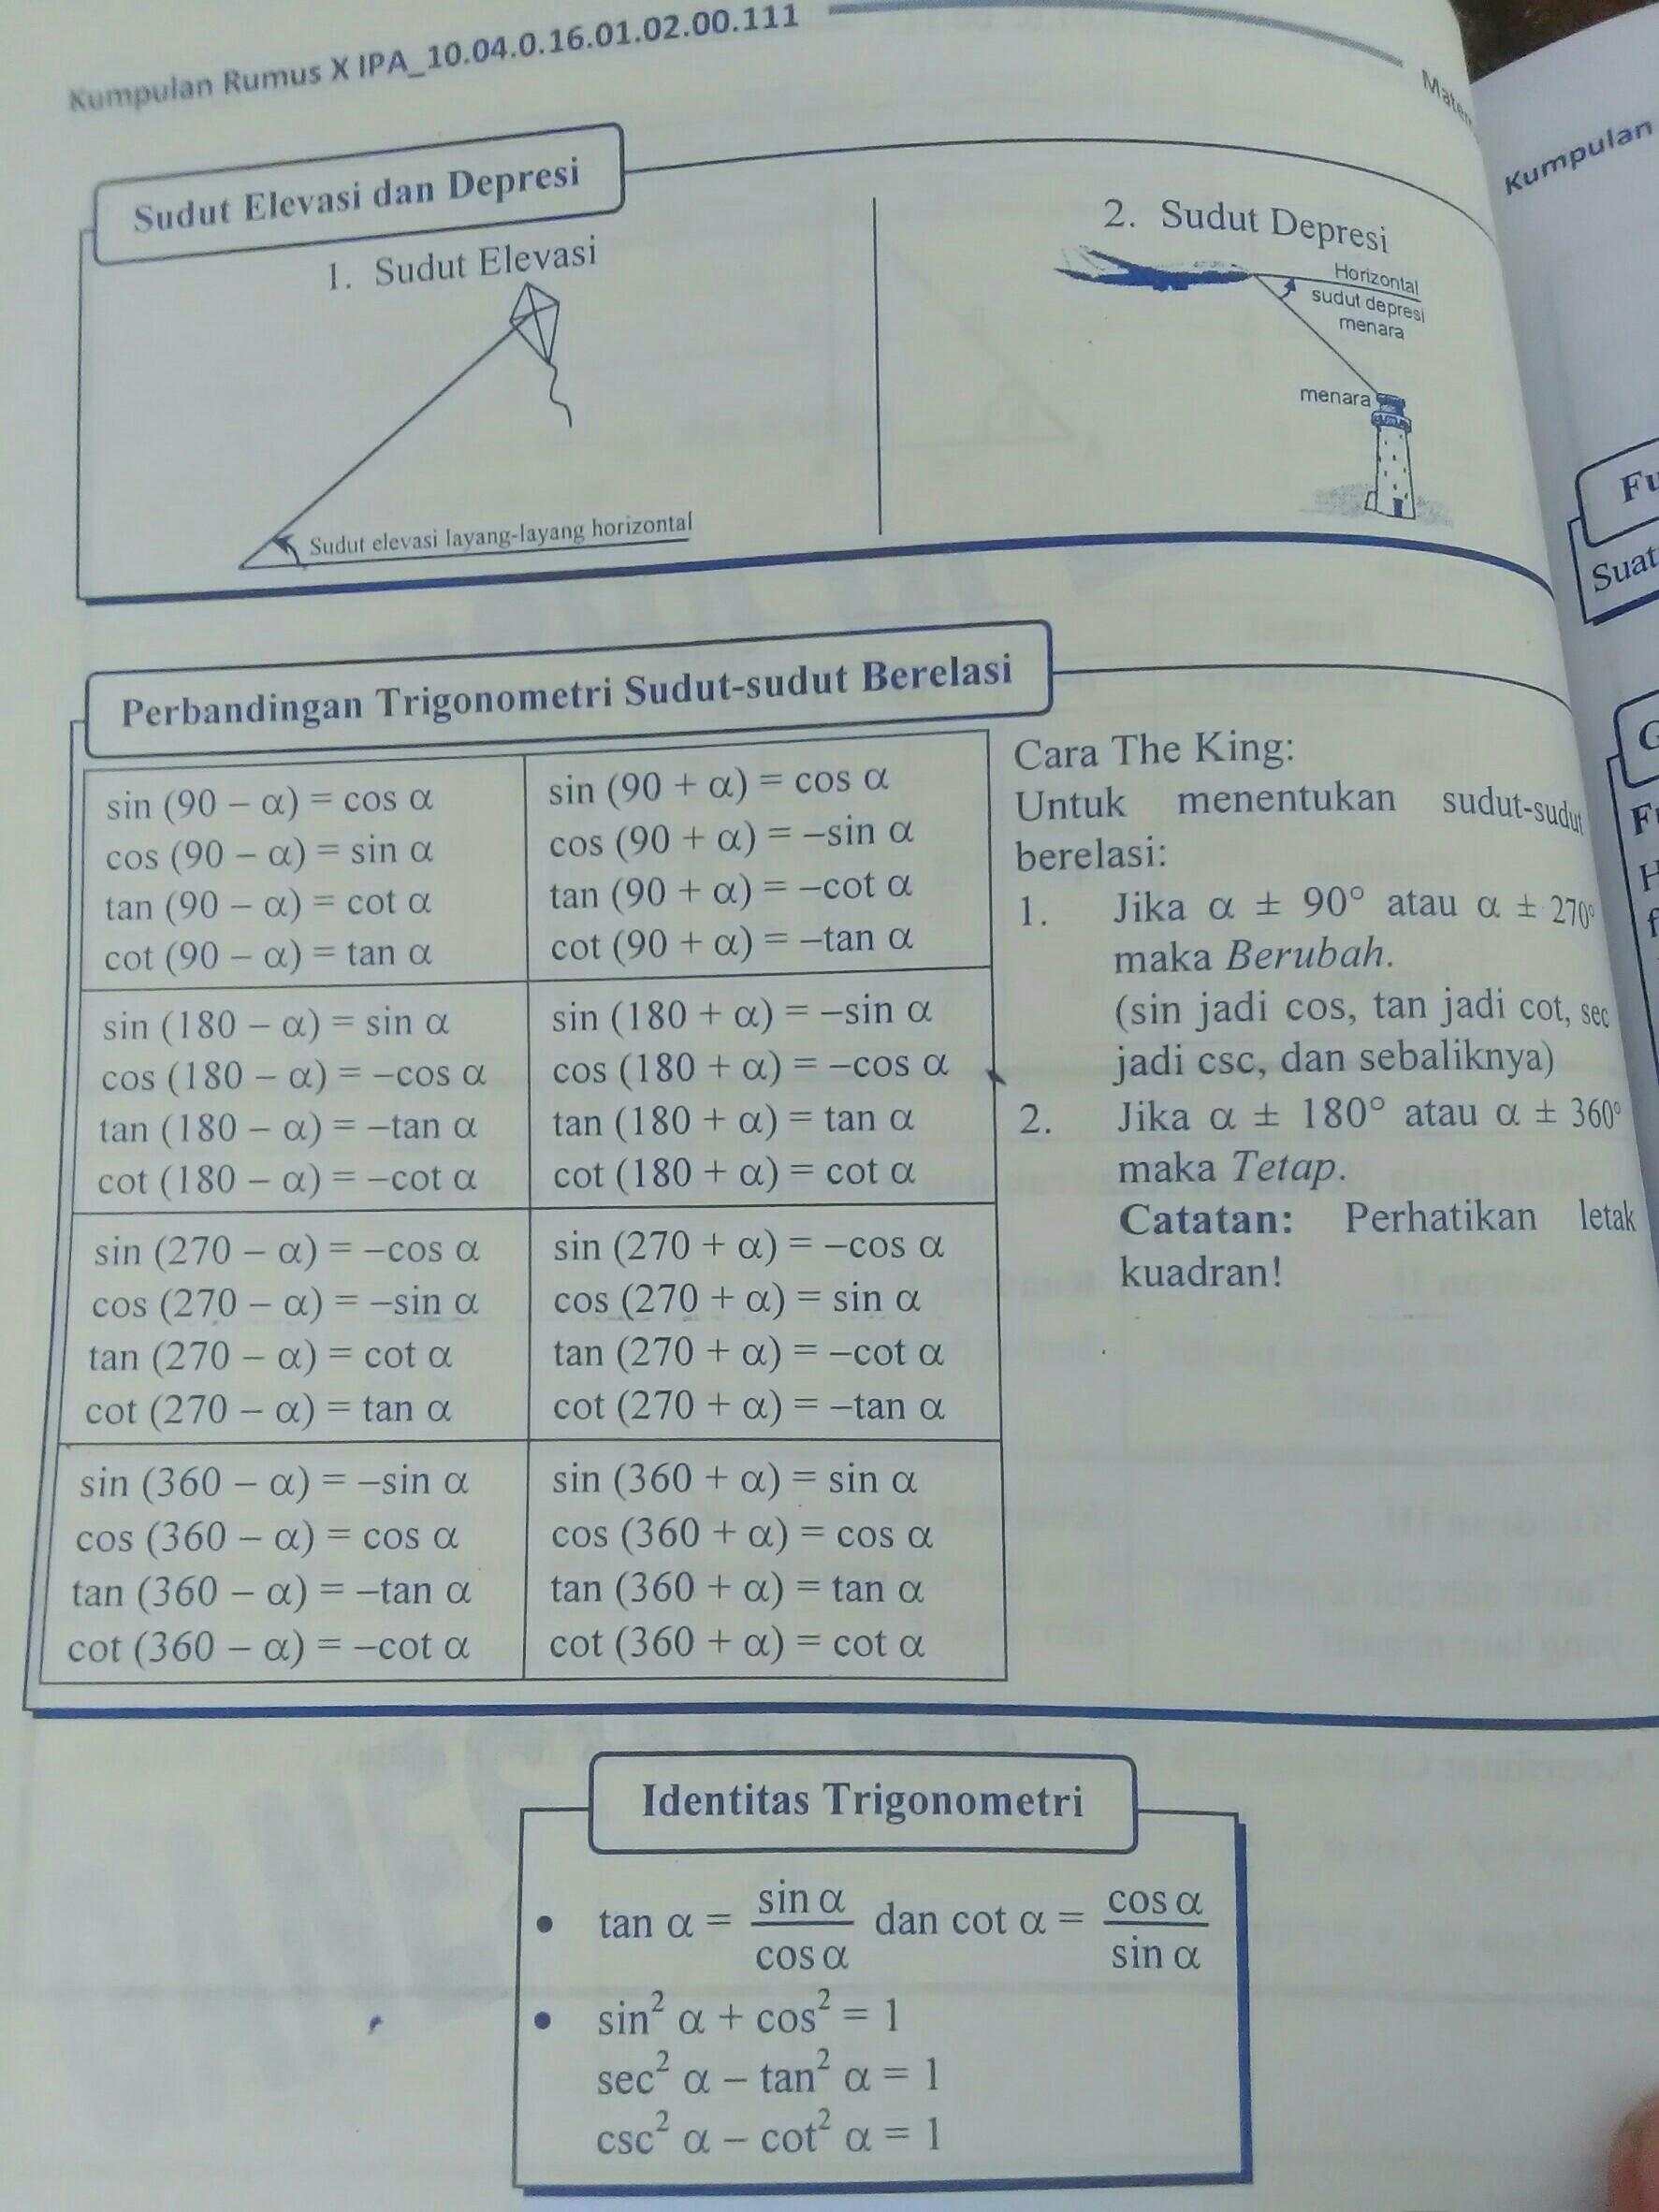 Perbandingan Trigonometri Sudut Berelasi : perbandingan, trigonometri, sudut, berelasi, Tuliskan, Rumus, Perbandingan, Trigonometri, Sudut, Berelasi, Dalam, Ukuran, Radian., A.sin(Π-a), Brainly.co.id